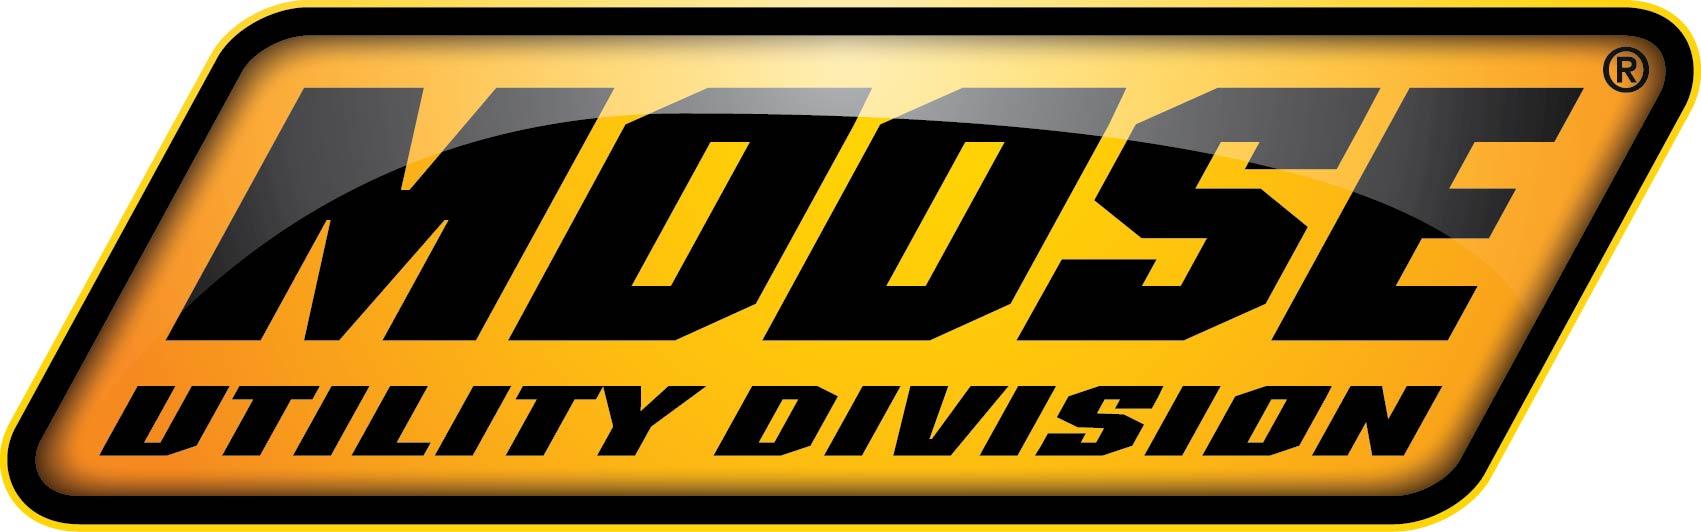 Moose Utility Division (MUD) logo